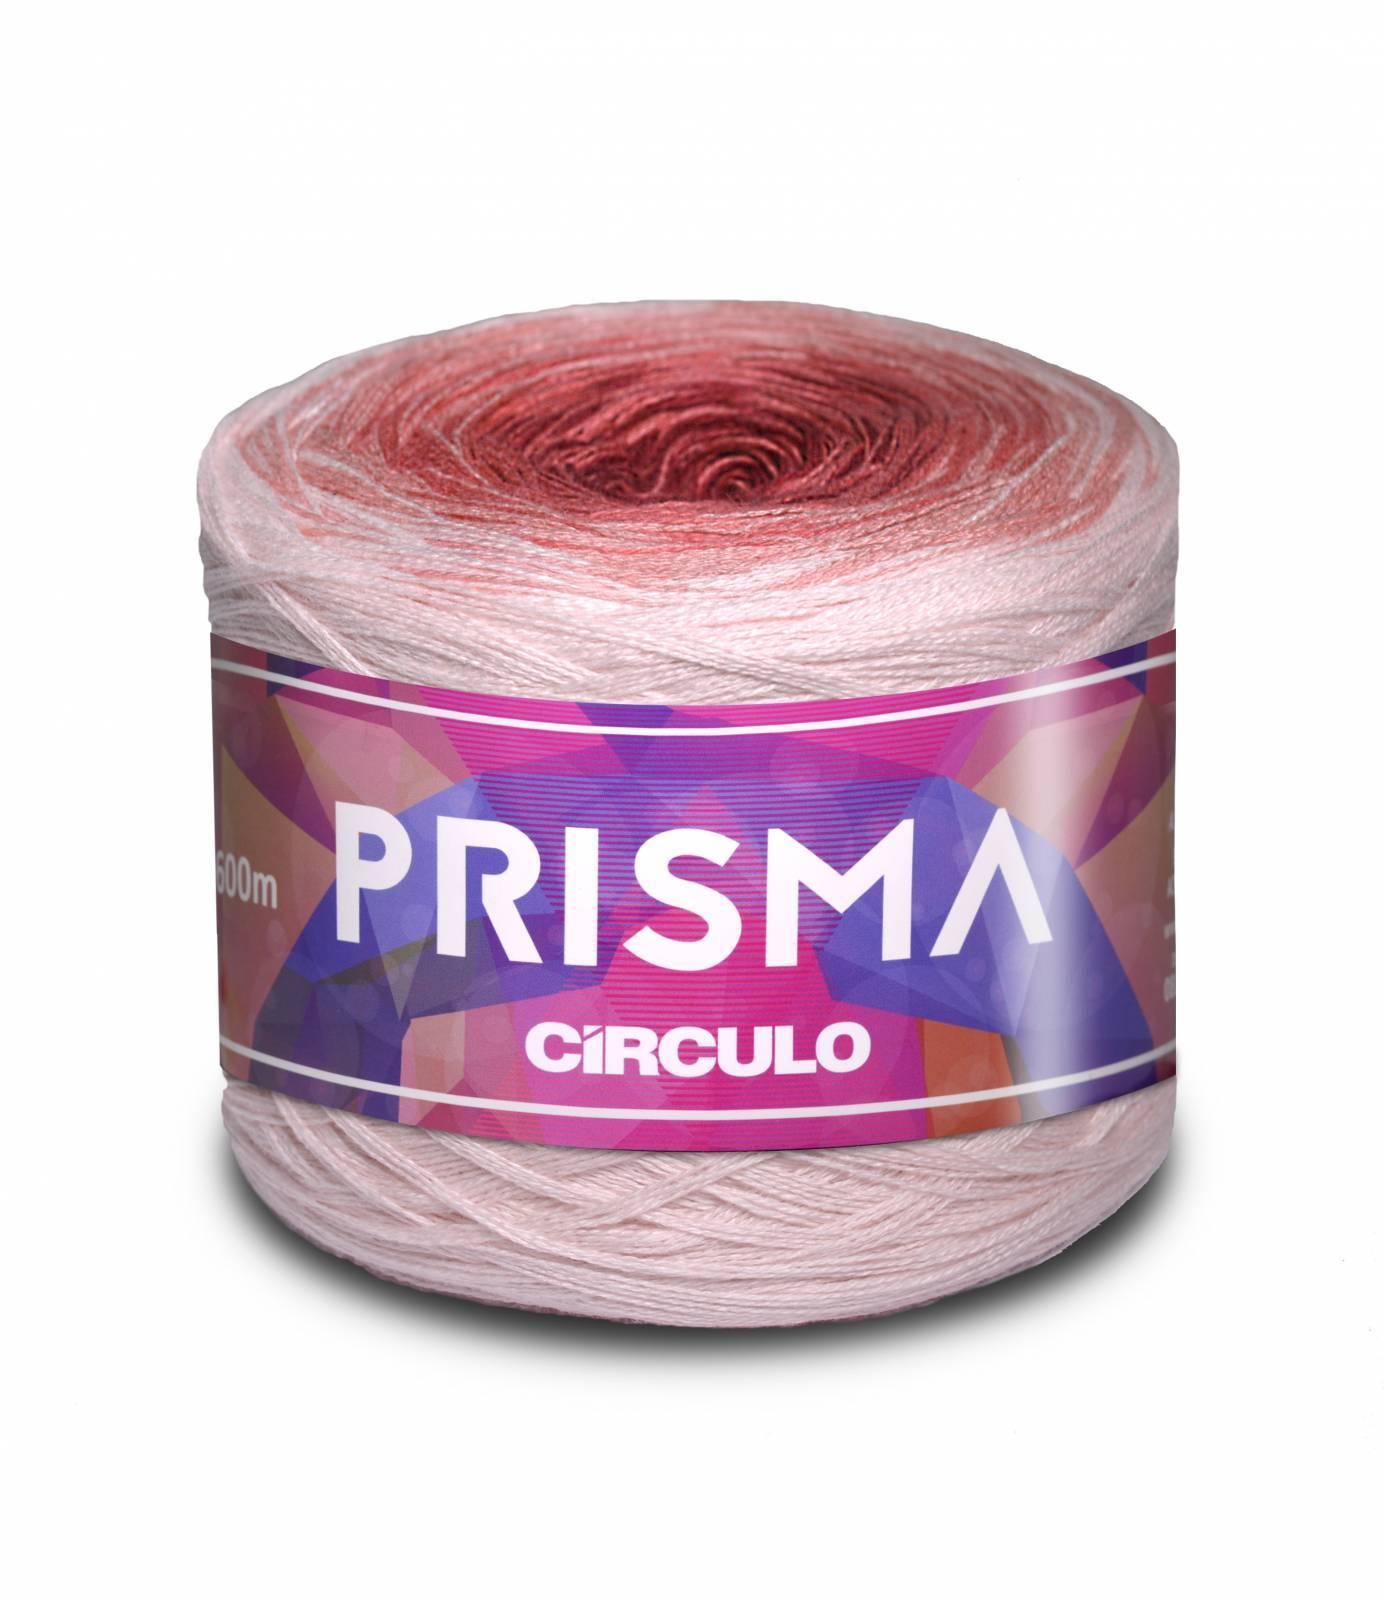 Prisma 9590 Zimbro - BAÚ DA VOVÓ